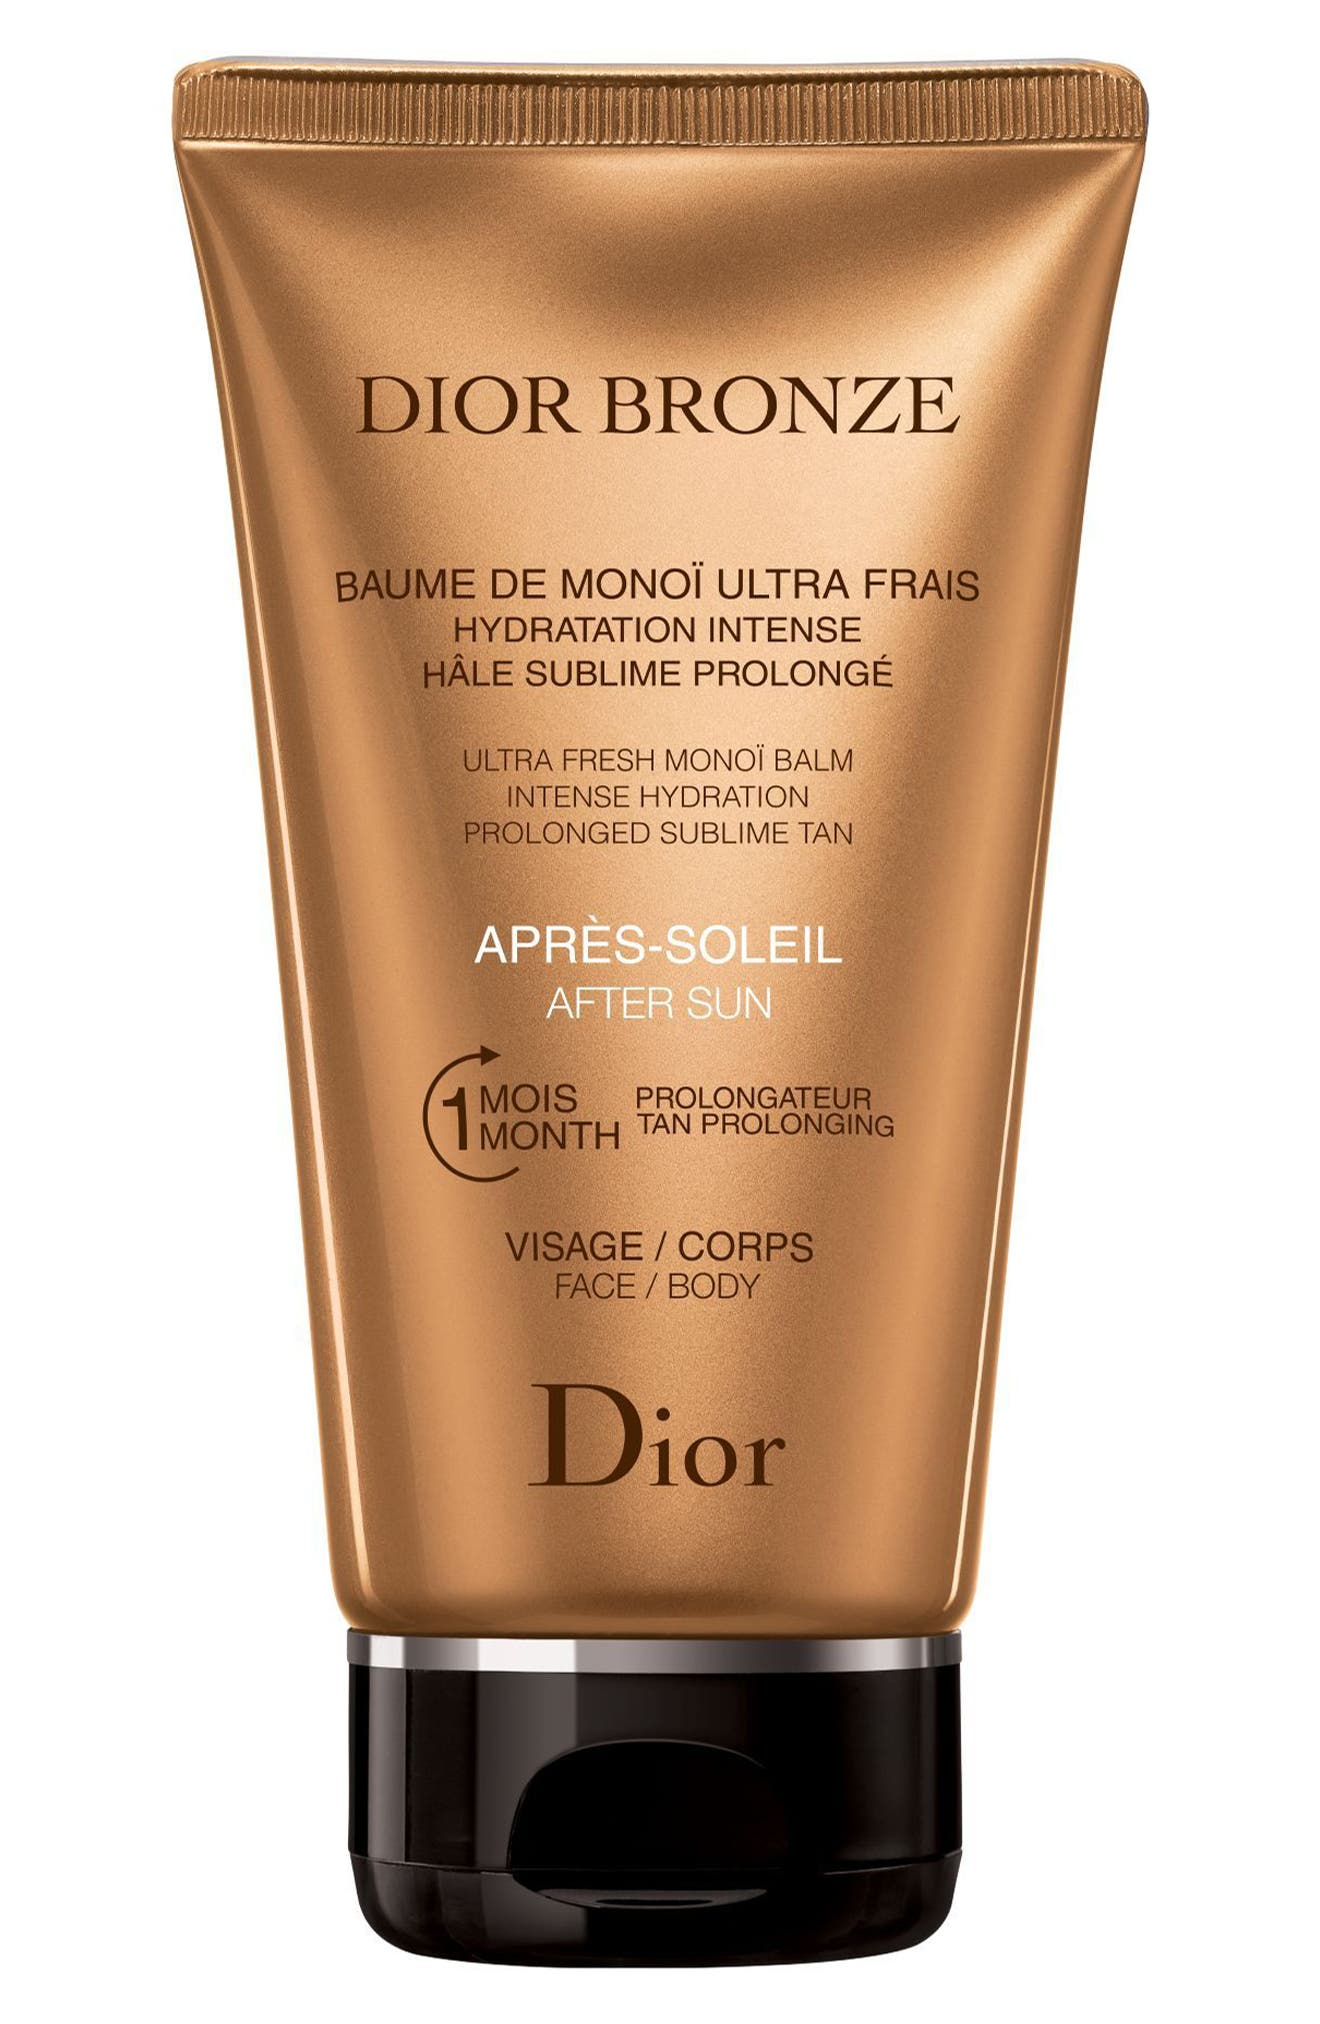 Dior Bronze After Sun Care Monoi Balm